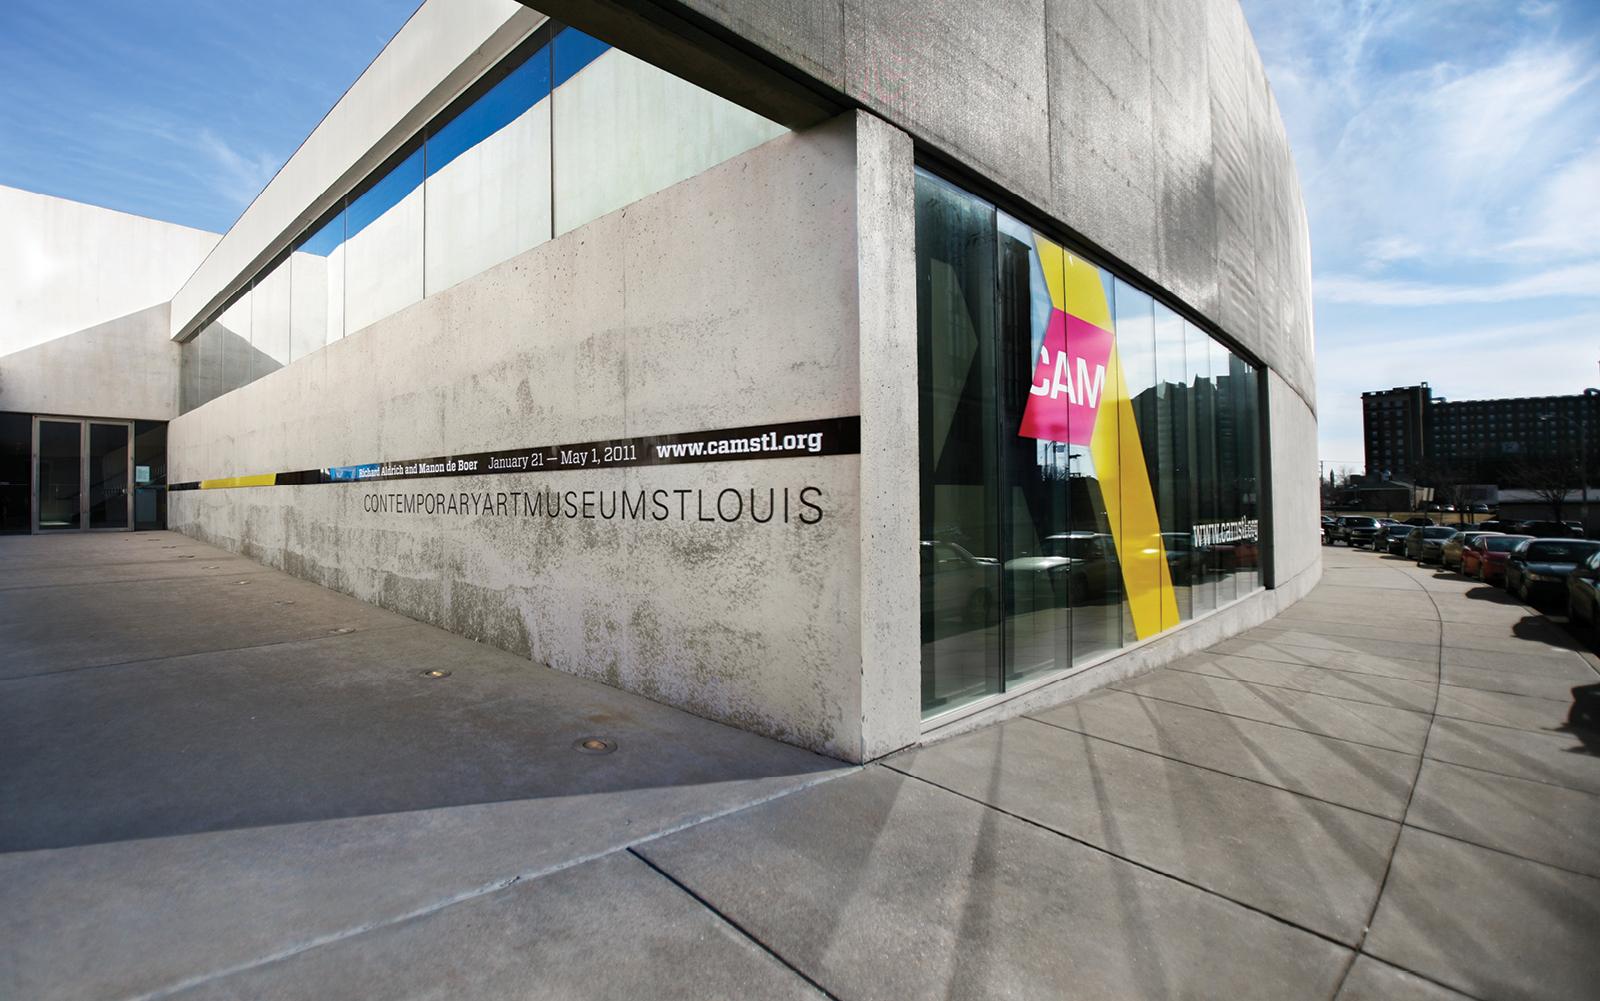 Contemporary art museum: st. Louis, Mo